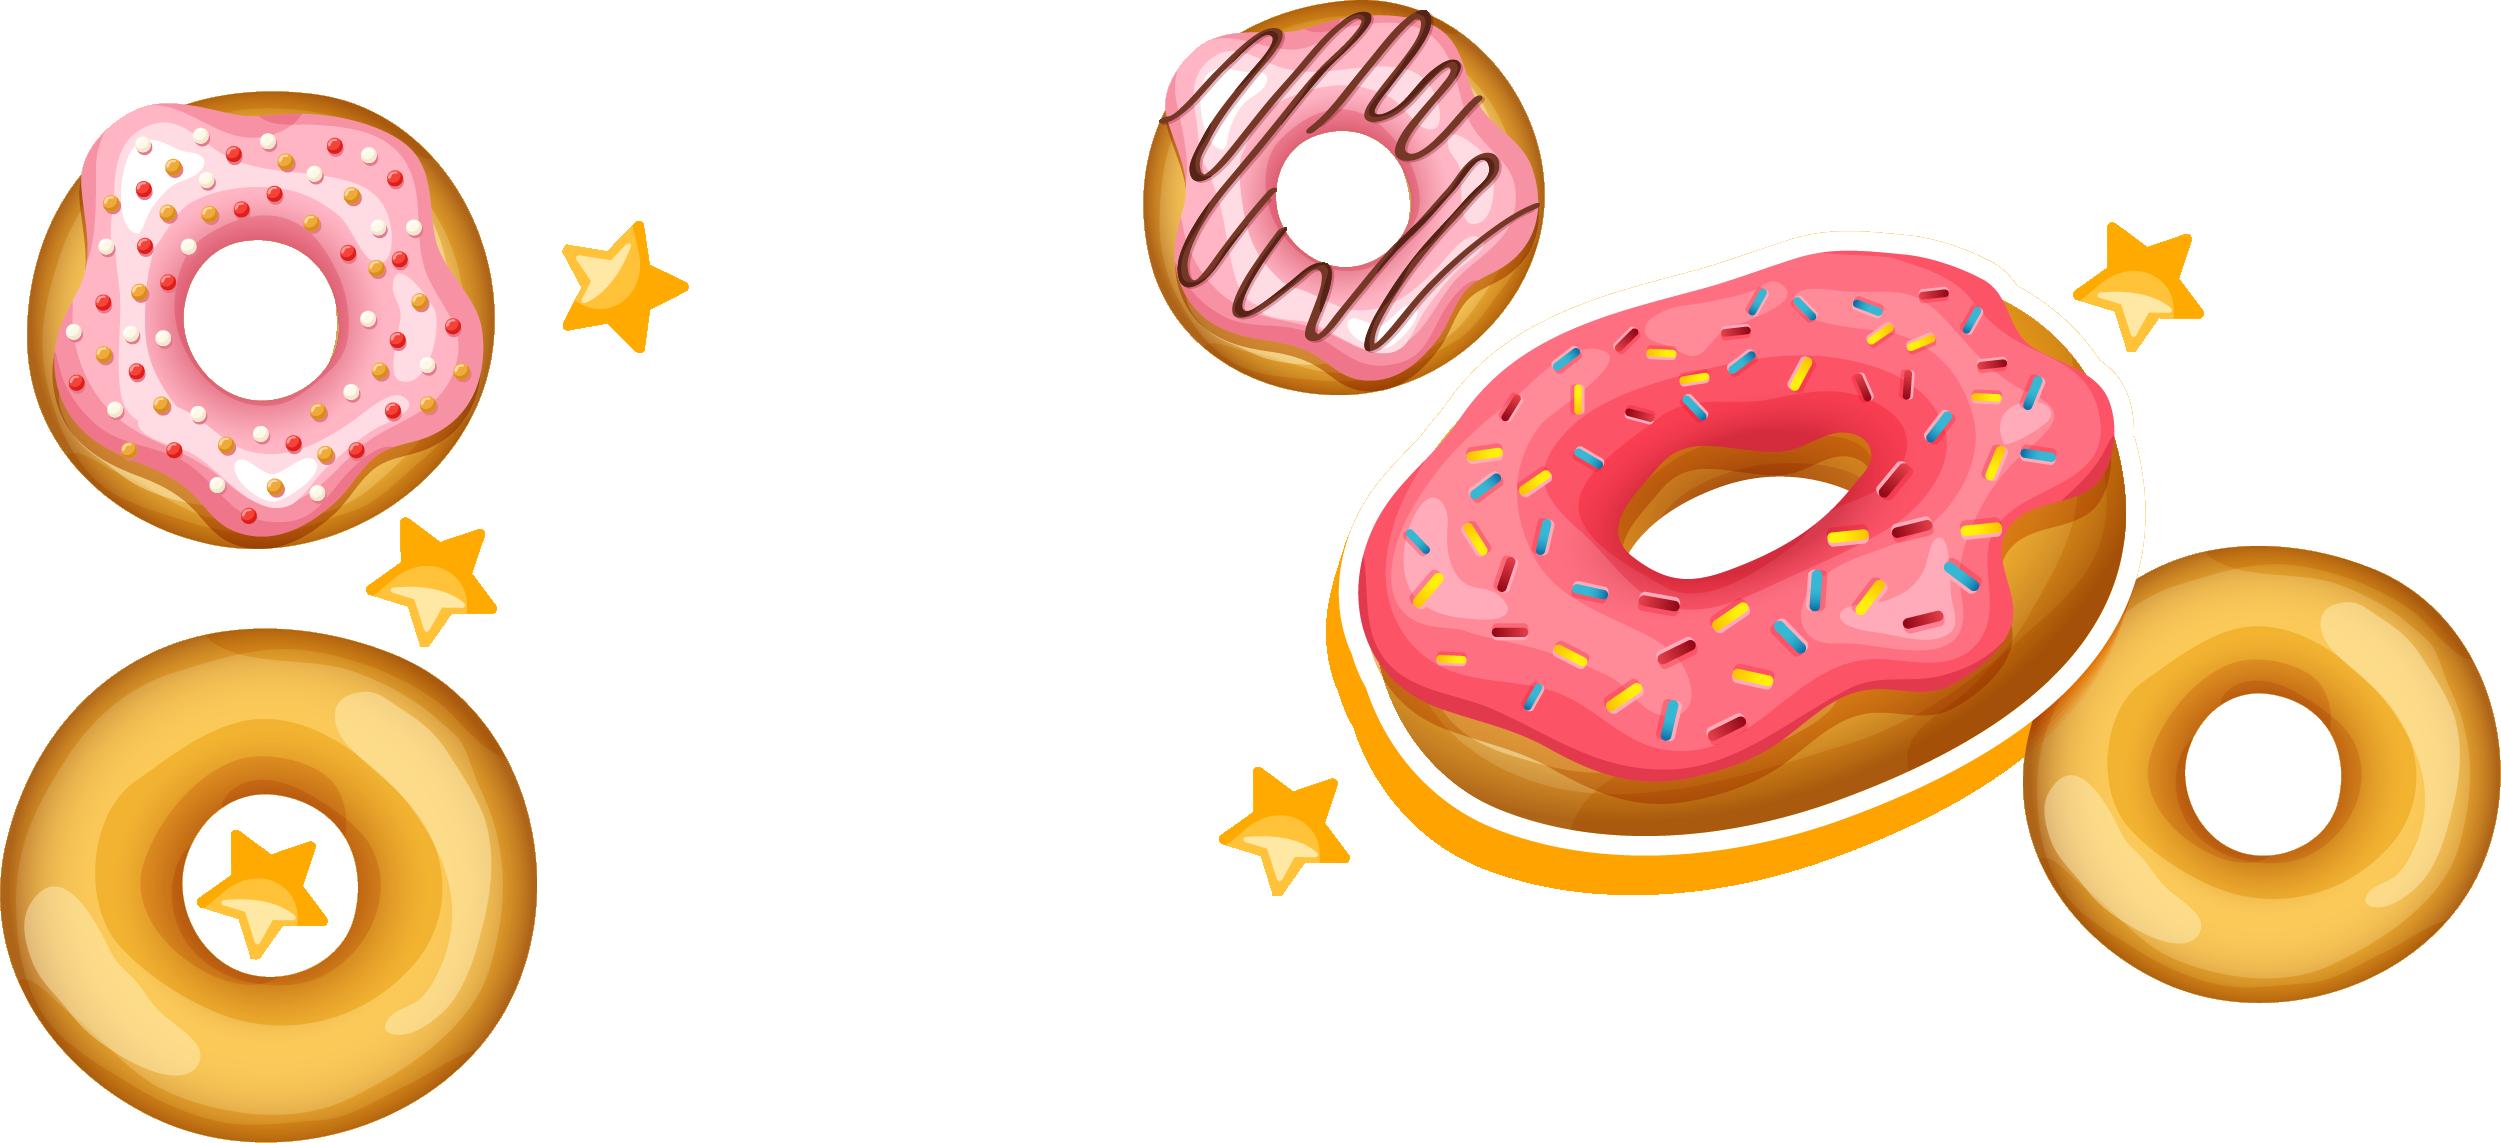 Snack cookie clip art. Doughnut clipart bagel